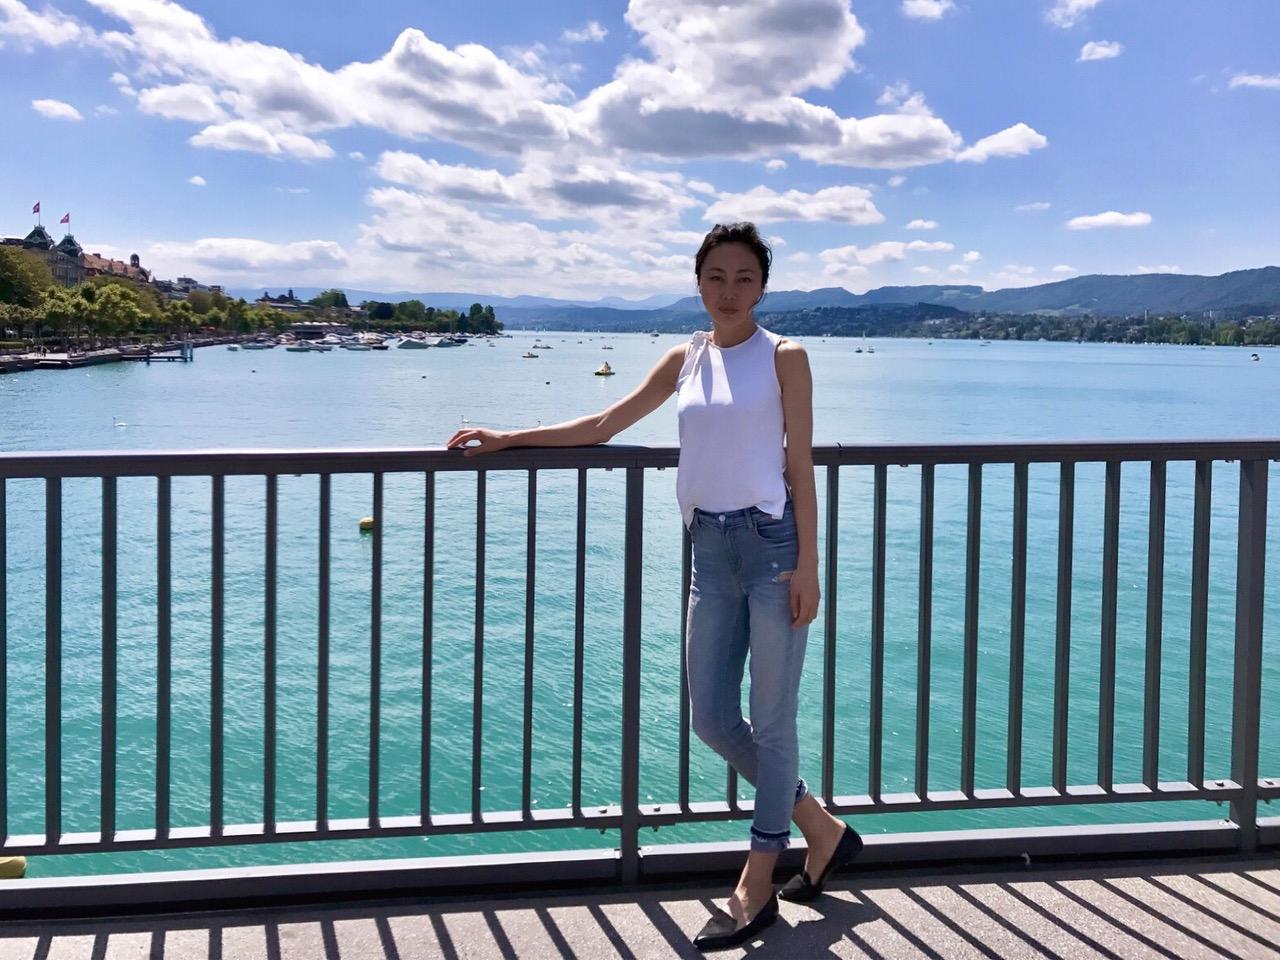 Xi Zhang enjoying the fresh air and the lake in Zurich.